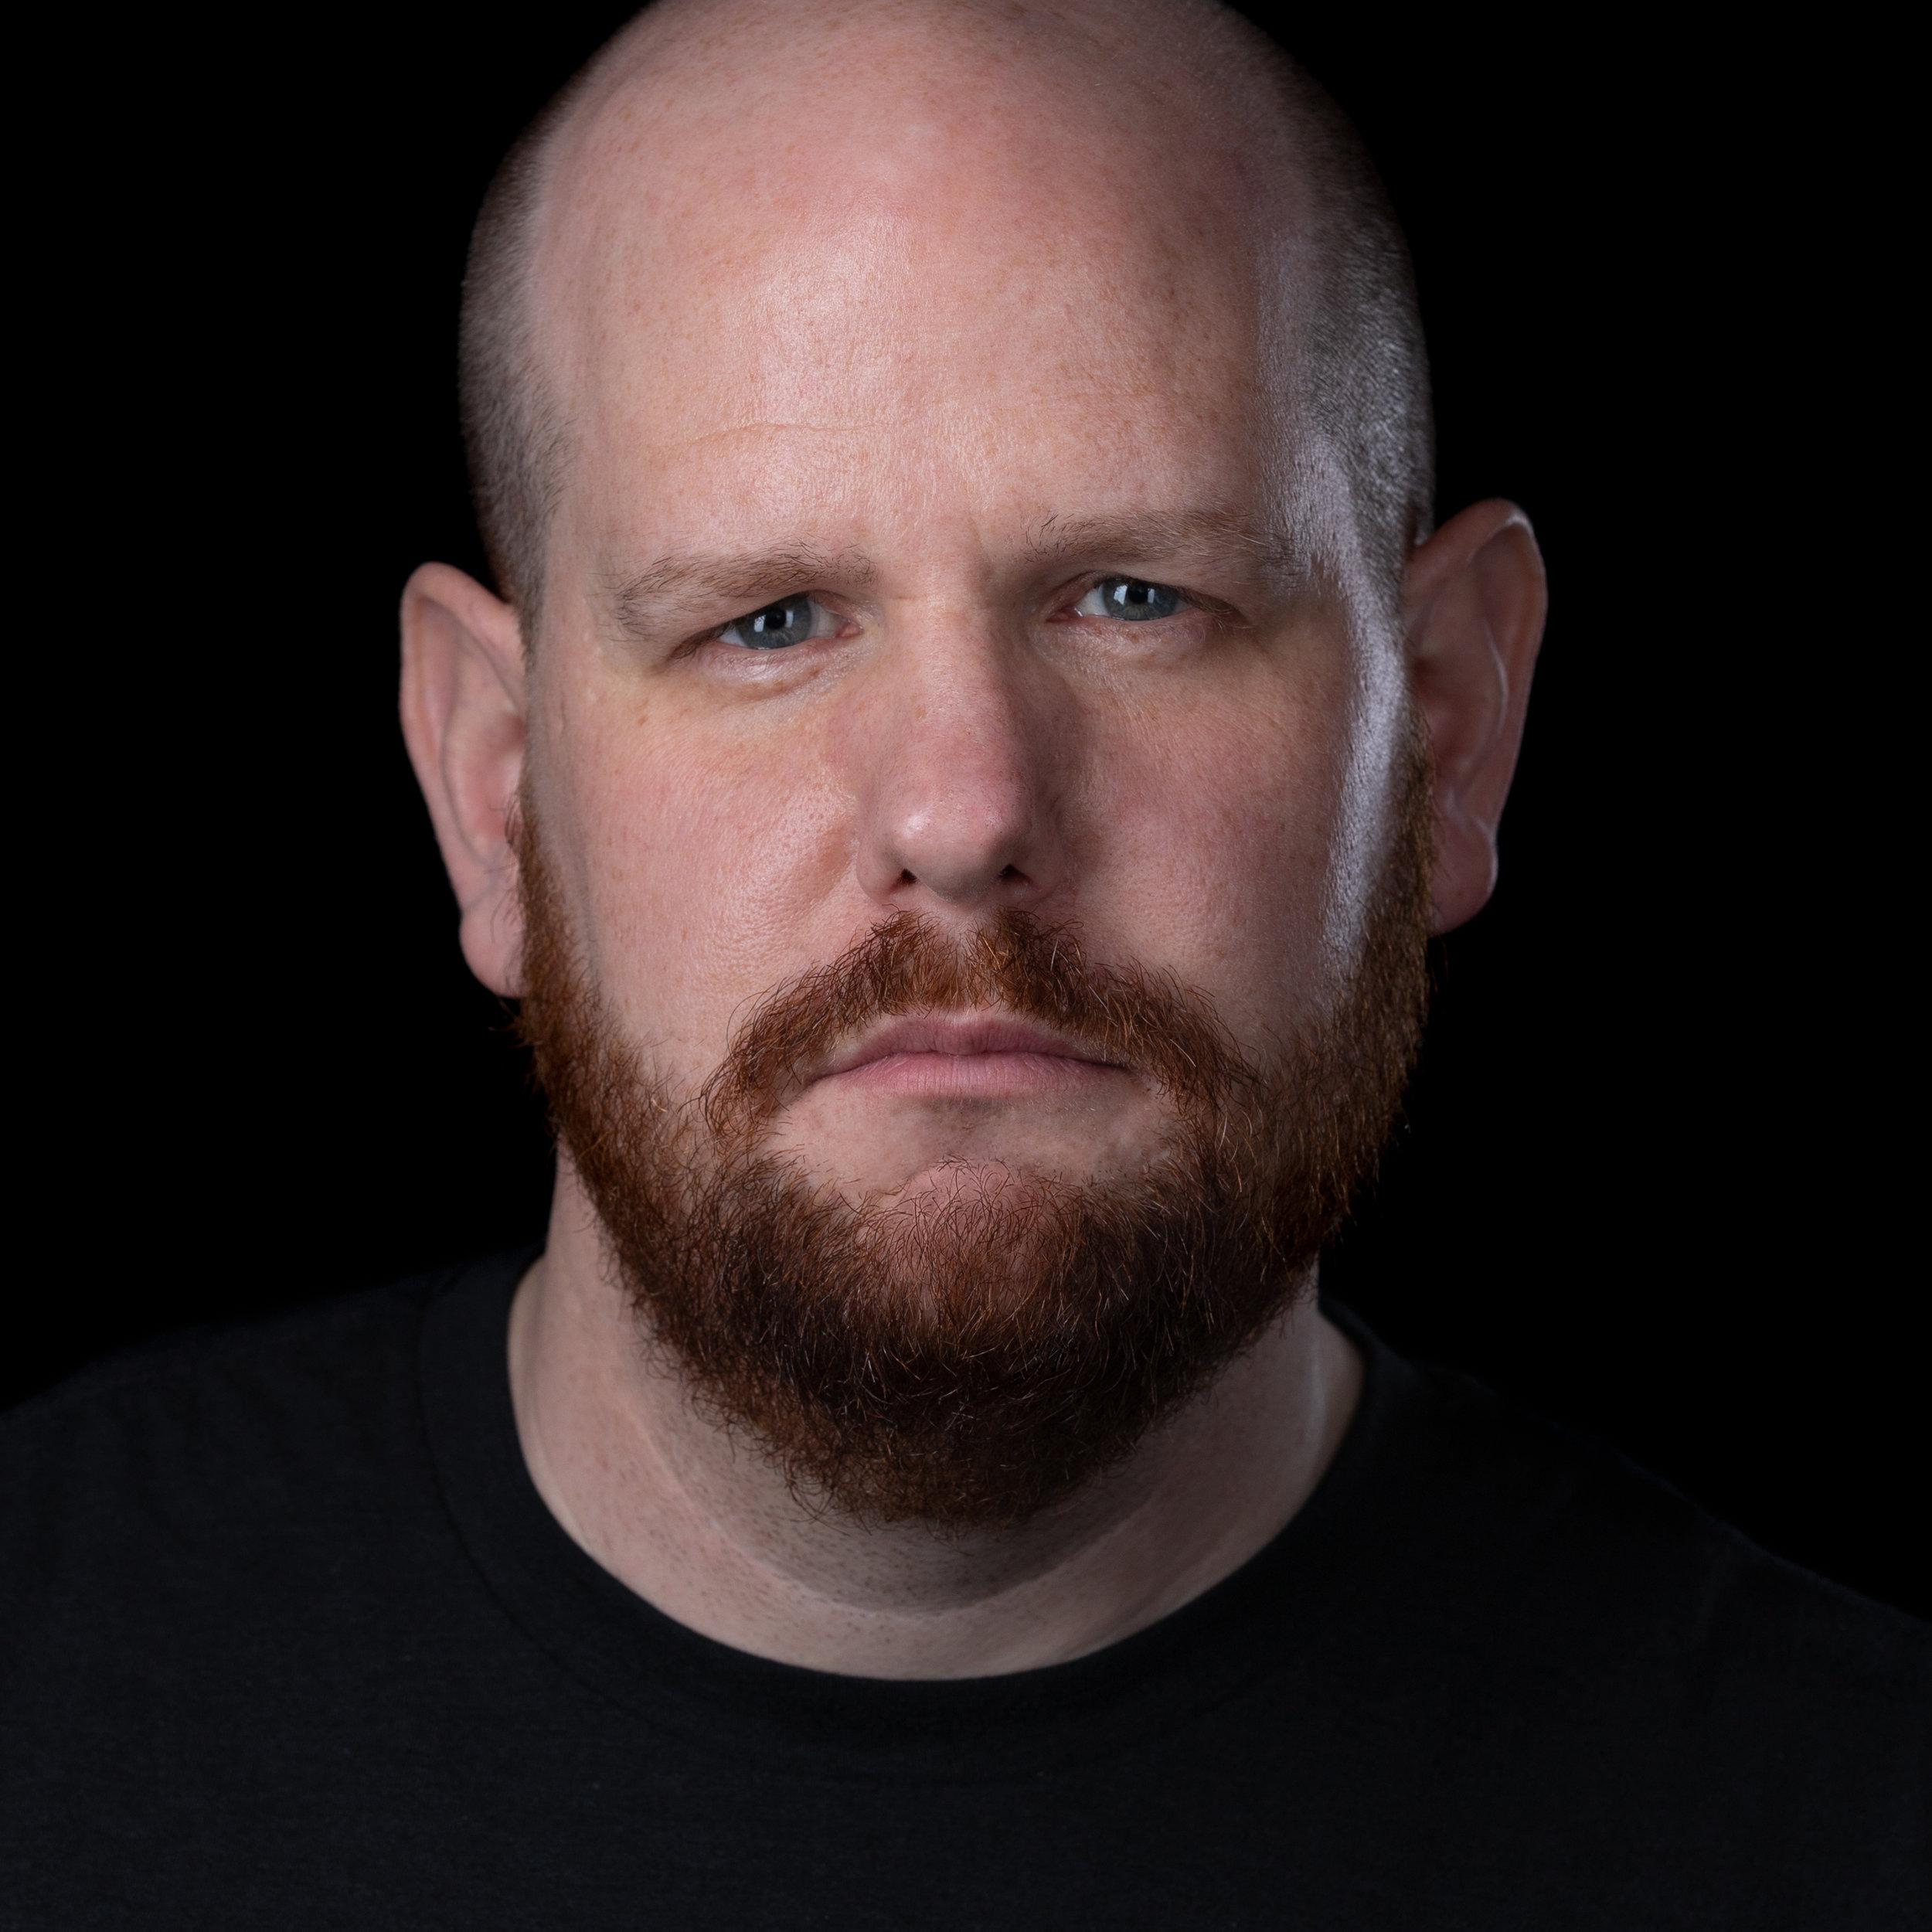 Chad Olson-Rohinni Headshots-778-Edit-3.JPG